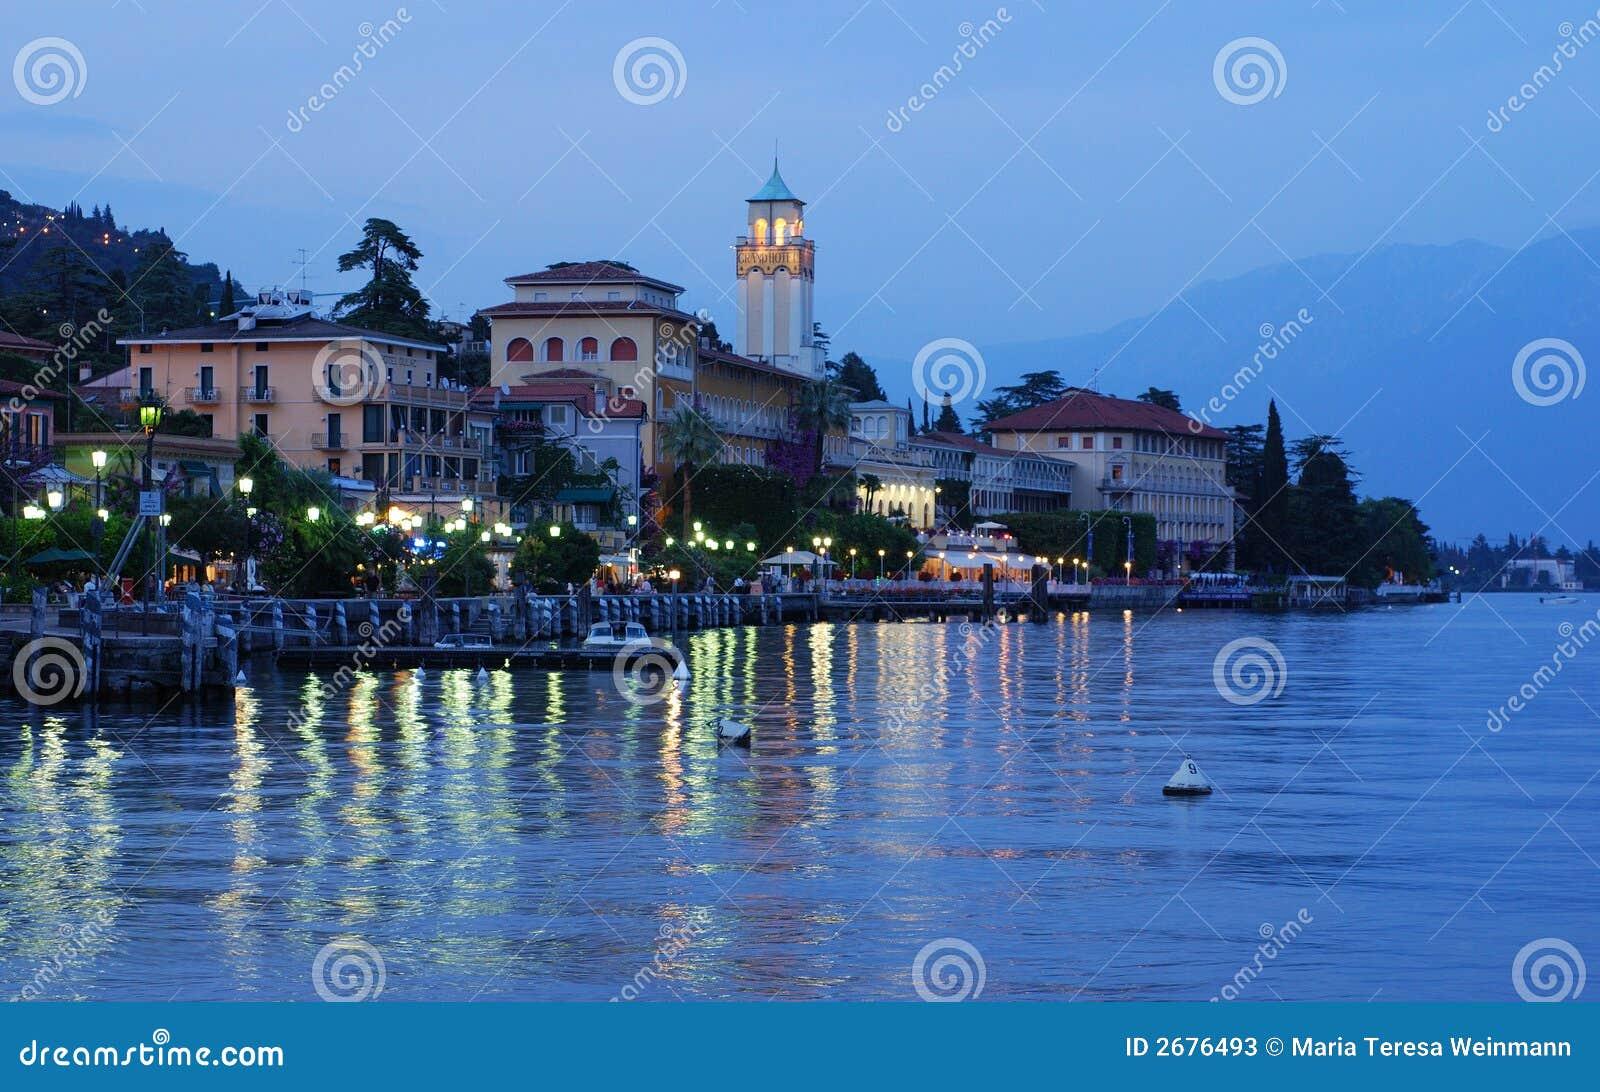 ... Gardona-Riviera on the westbank of lake Garda, Italy - evening view